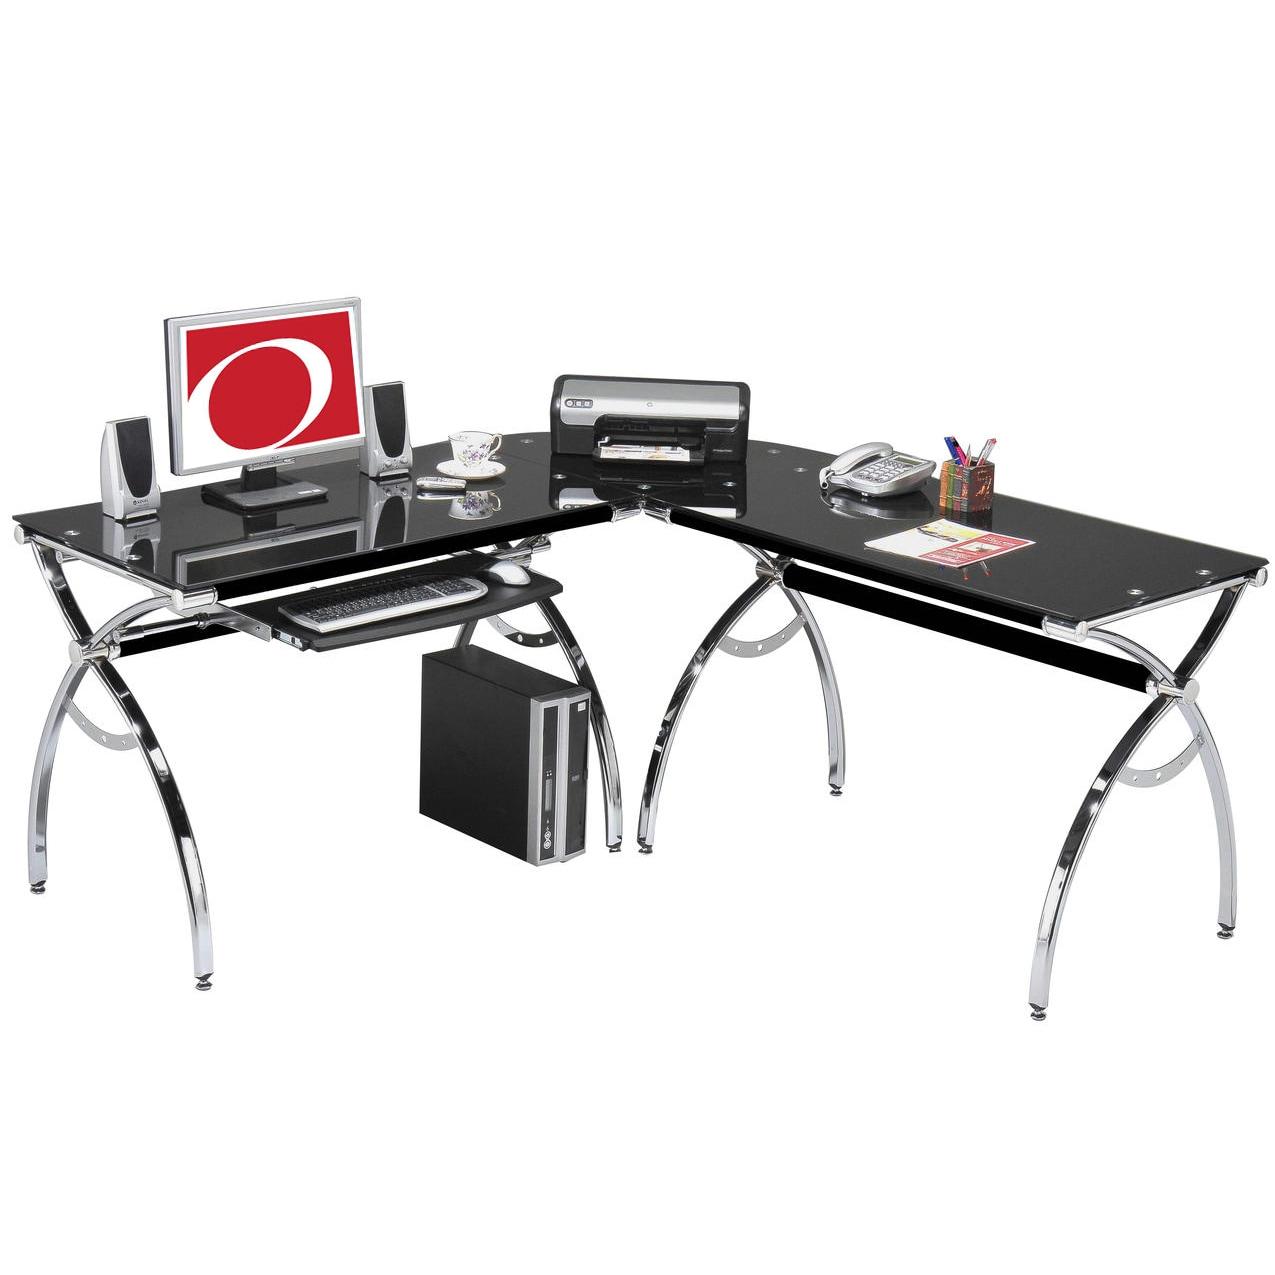 desk computer furniture hillsdale and chair red reviews desks l set studio barrel shaped pdx wayfair